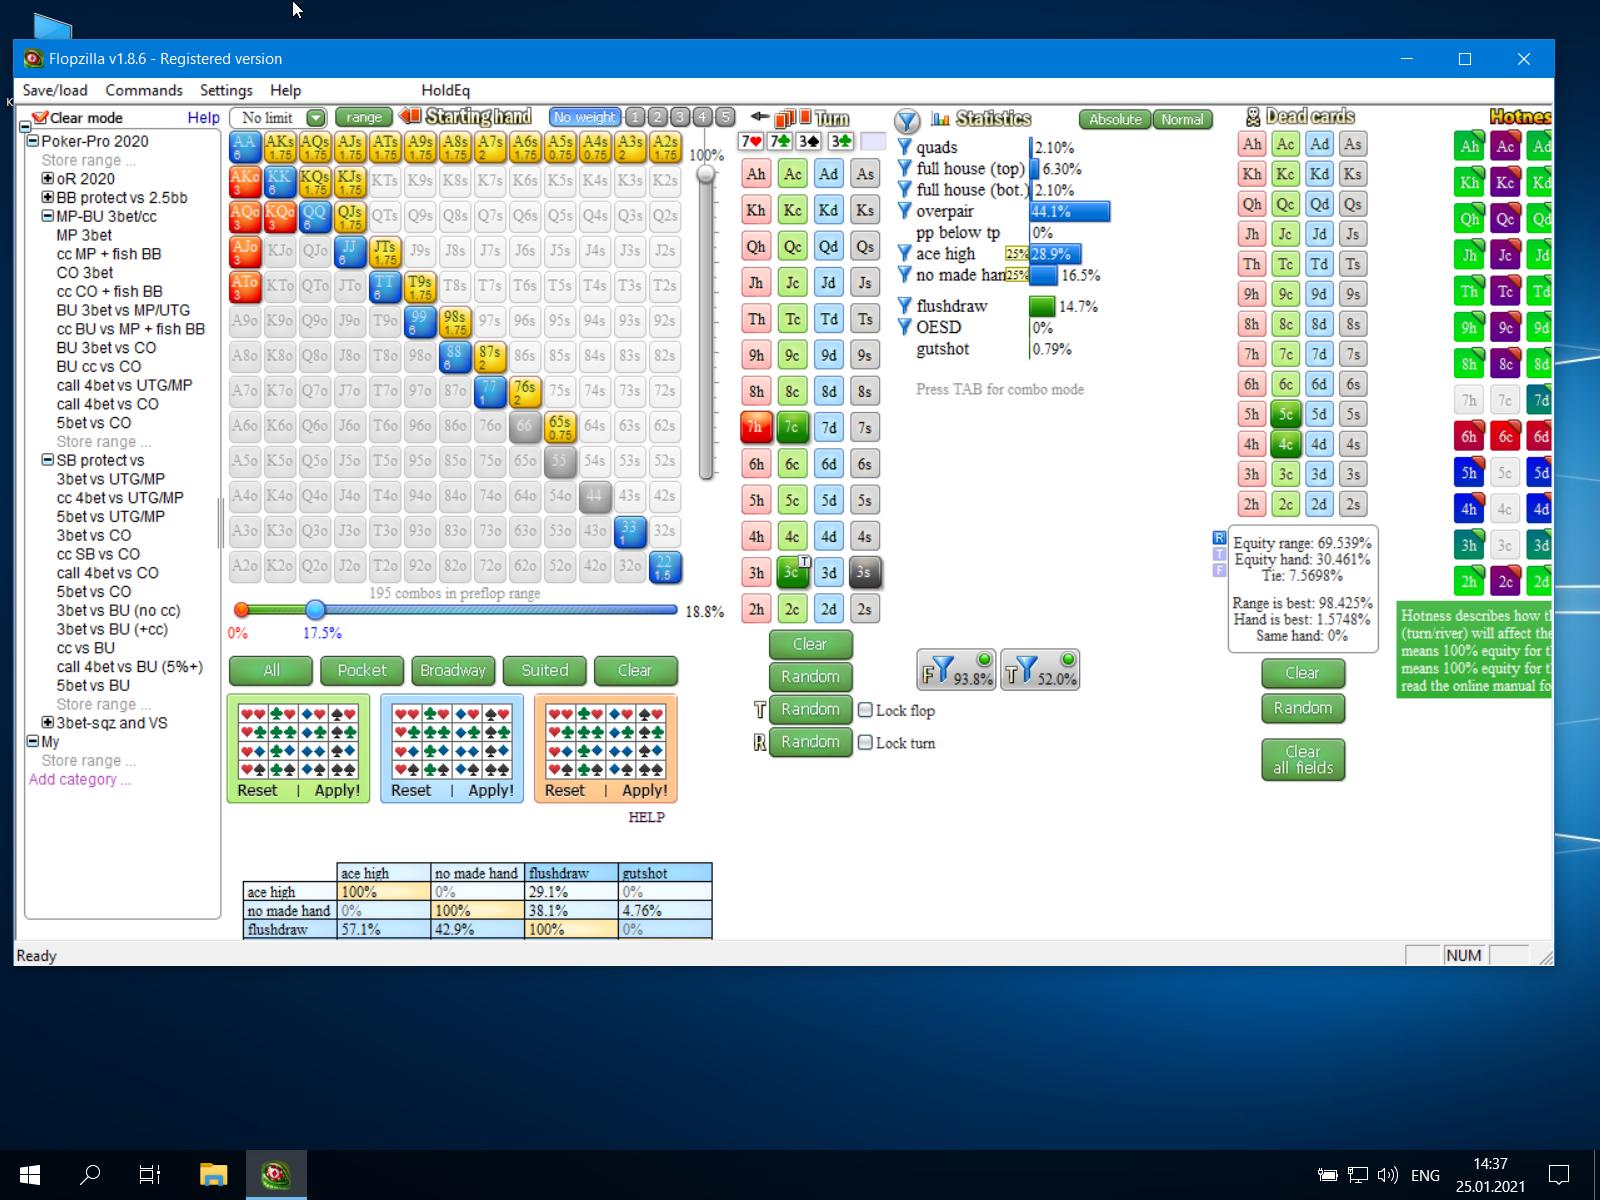 virtualboxwin-10250120211437371611574673.png